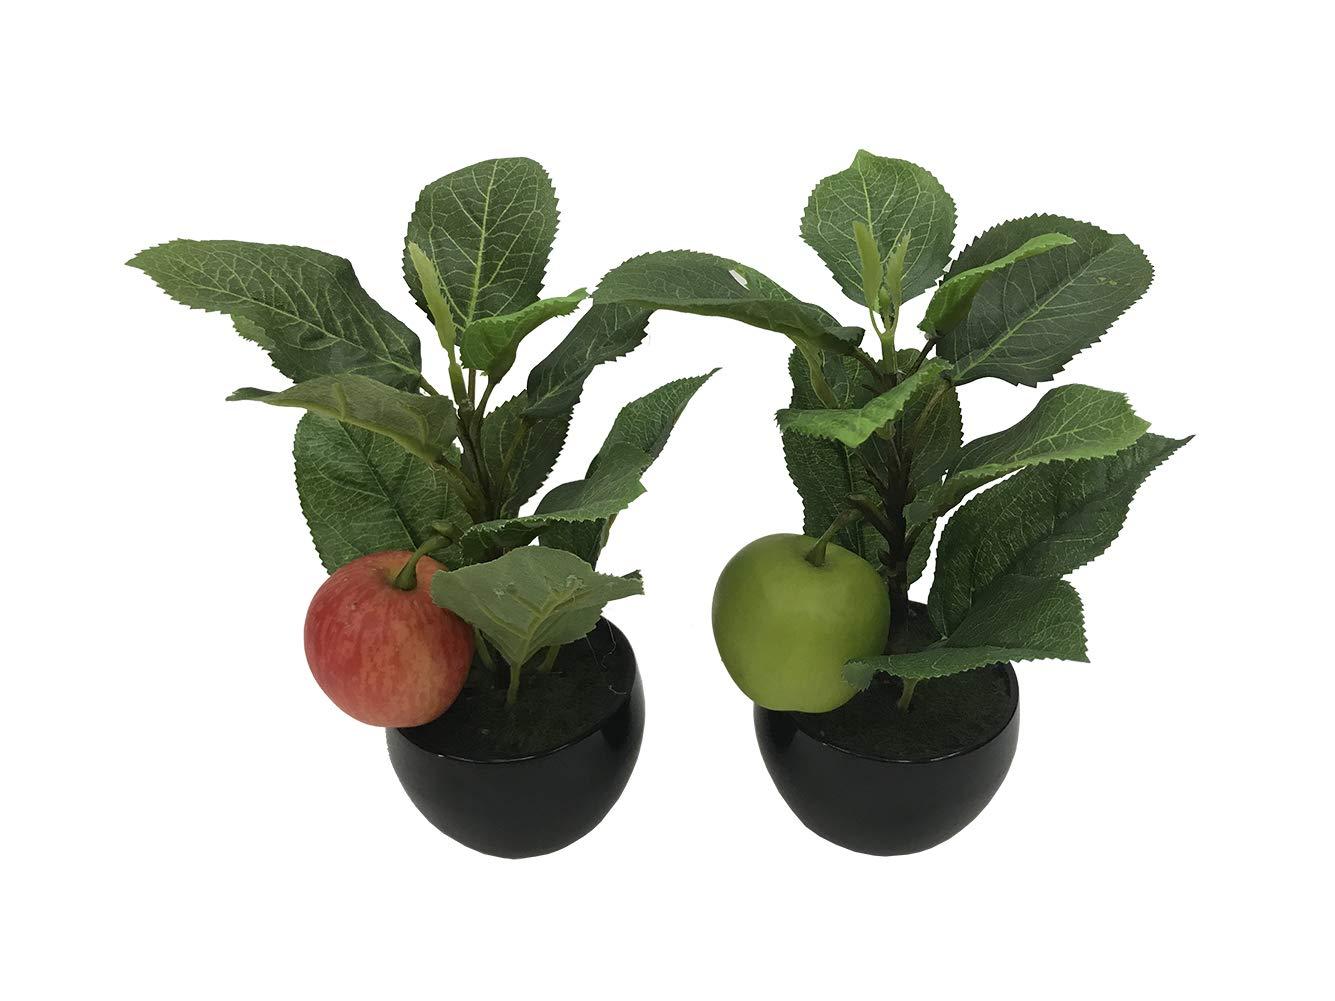 Simulation Fruit Tree Artificial Apple Mini Bonsai Potted Plant Office Home Table Decor Set of 2